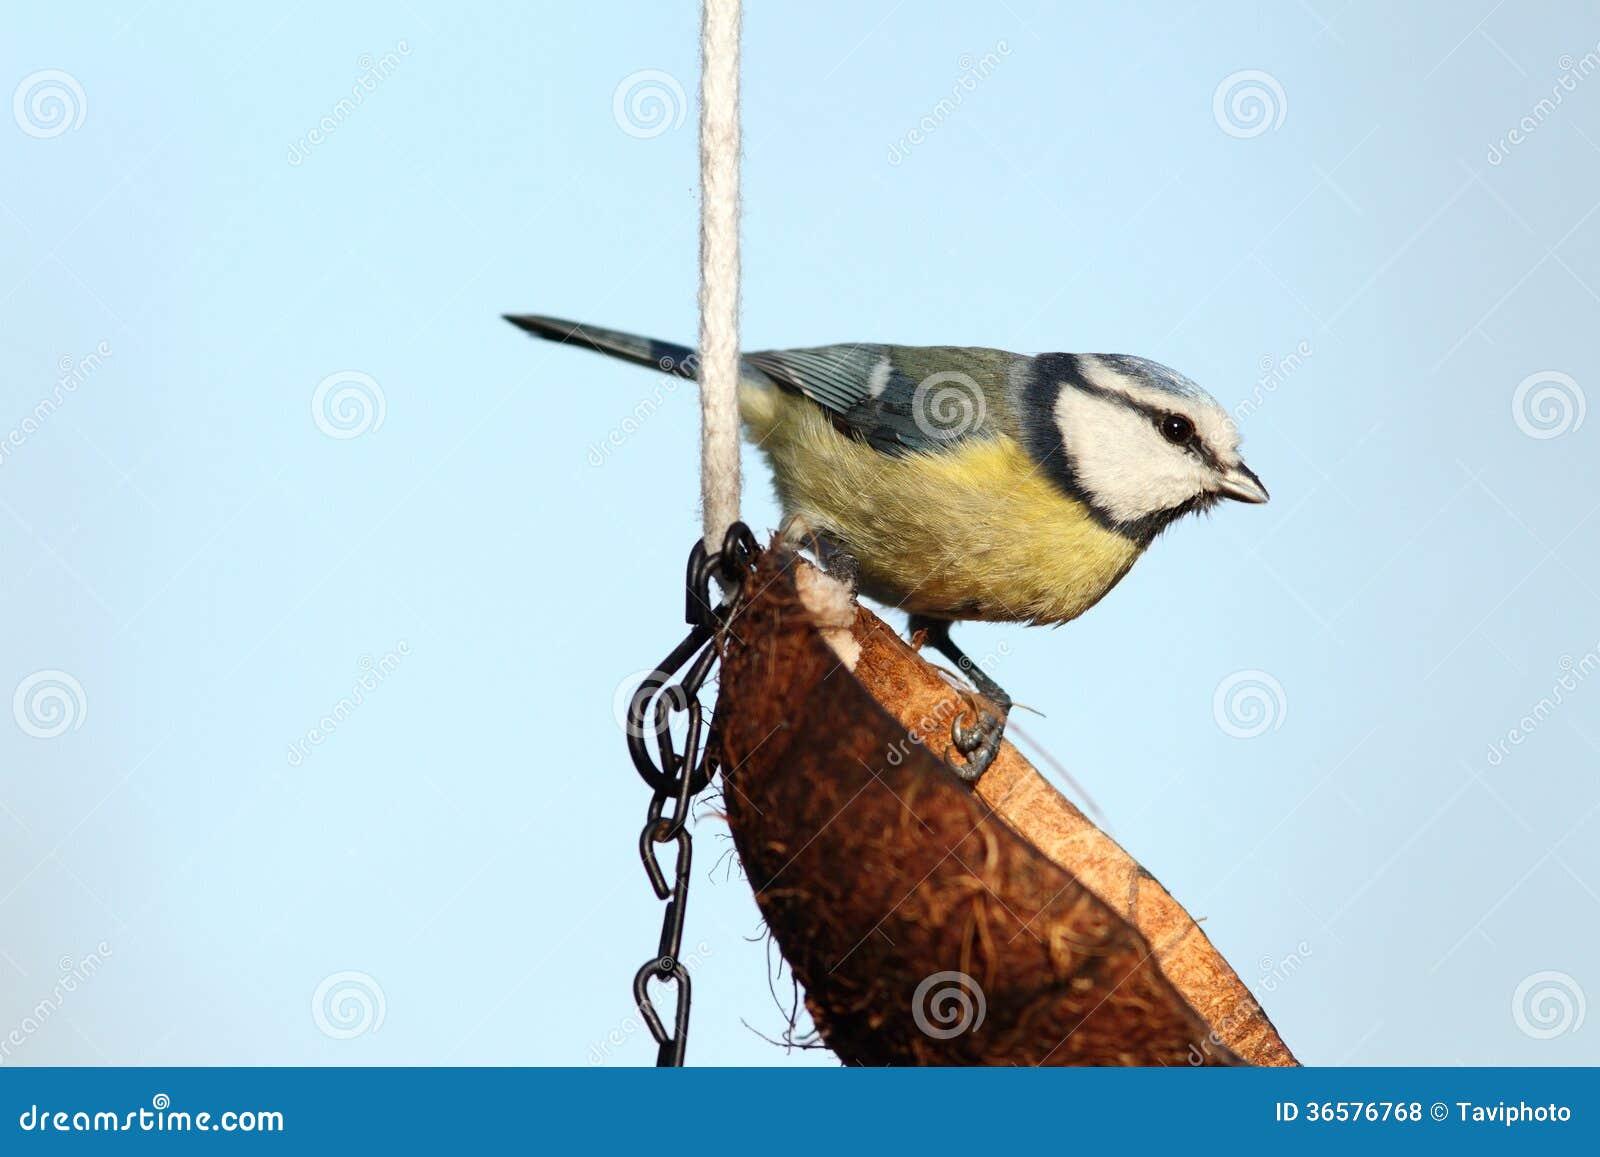 small garden bird royalty free stock photos image 36576768. Black Bedroom Furniture Sets. Home Design Ideas